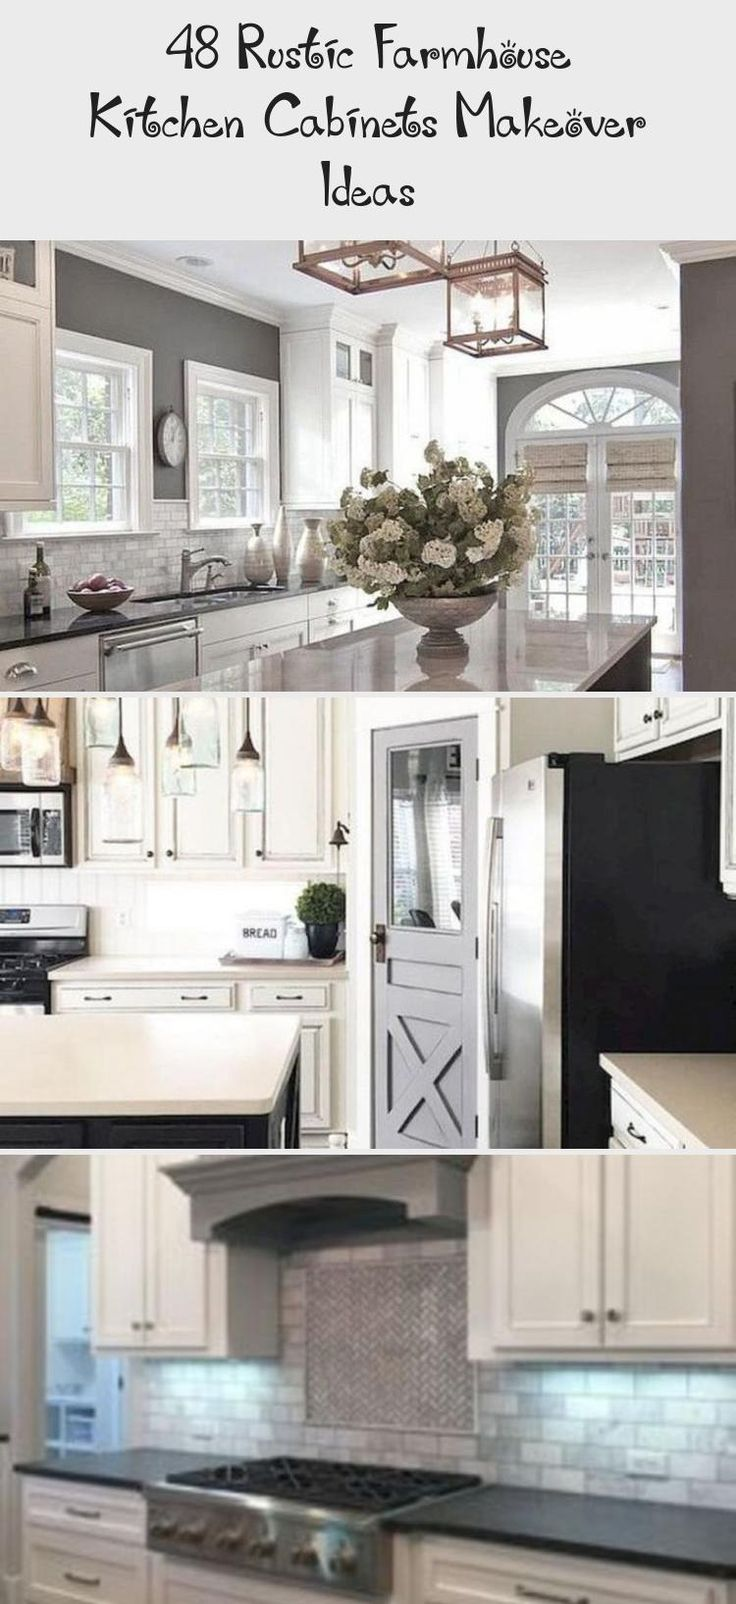 48 Rustic Farmhouse Kitchen Cabinets Makeover Ideas ... on Rustic:yucvisfte_S= Farmhouse Kitchen Ideas  id=60977